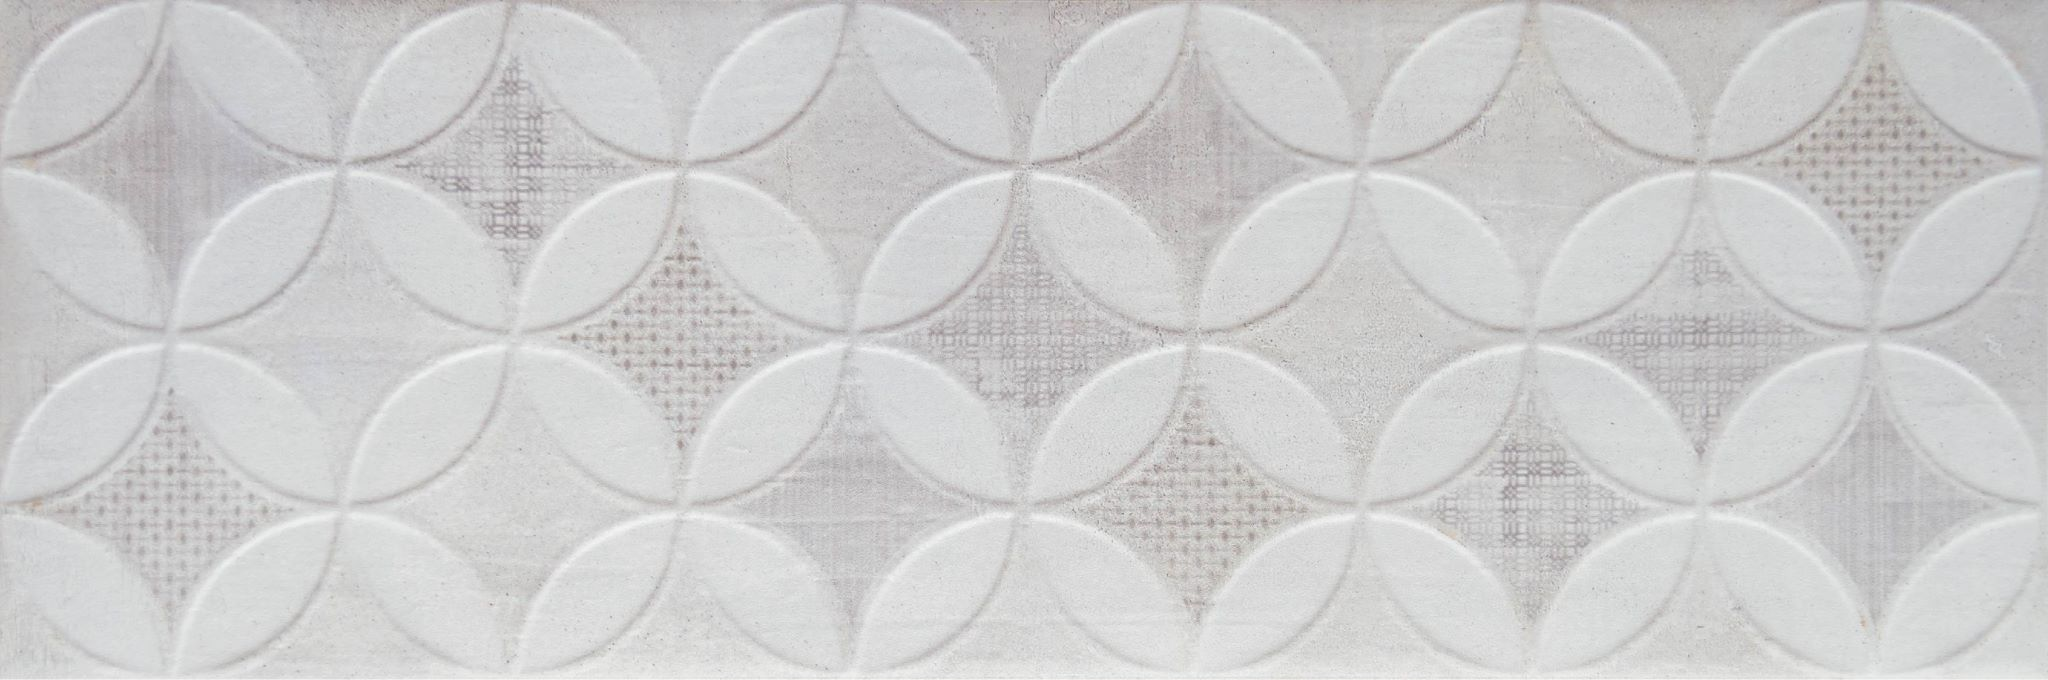 Vico pearl (Casale dek ringid) 146216 20x60x0,95 - Hansas Plaadimaailm